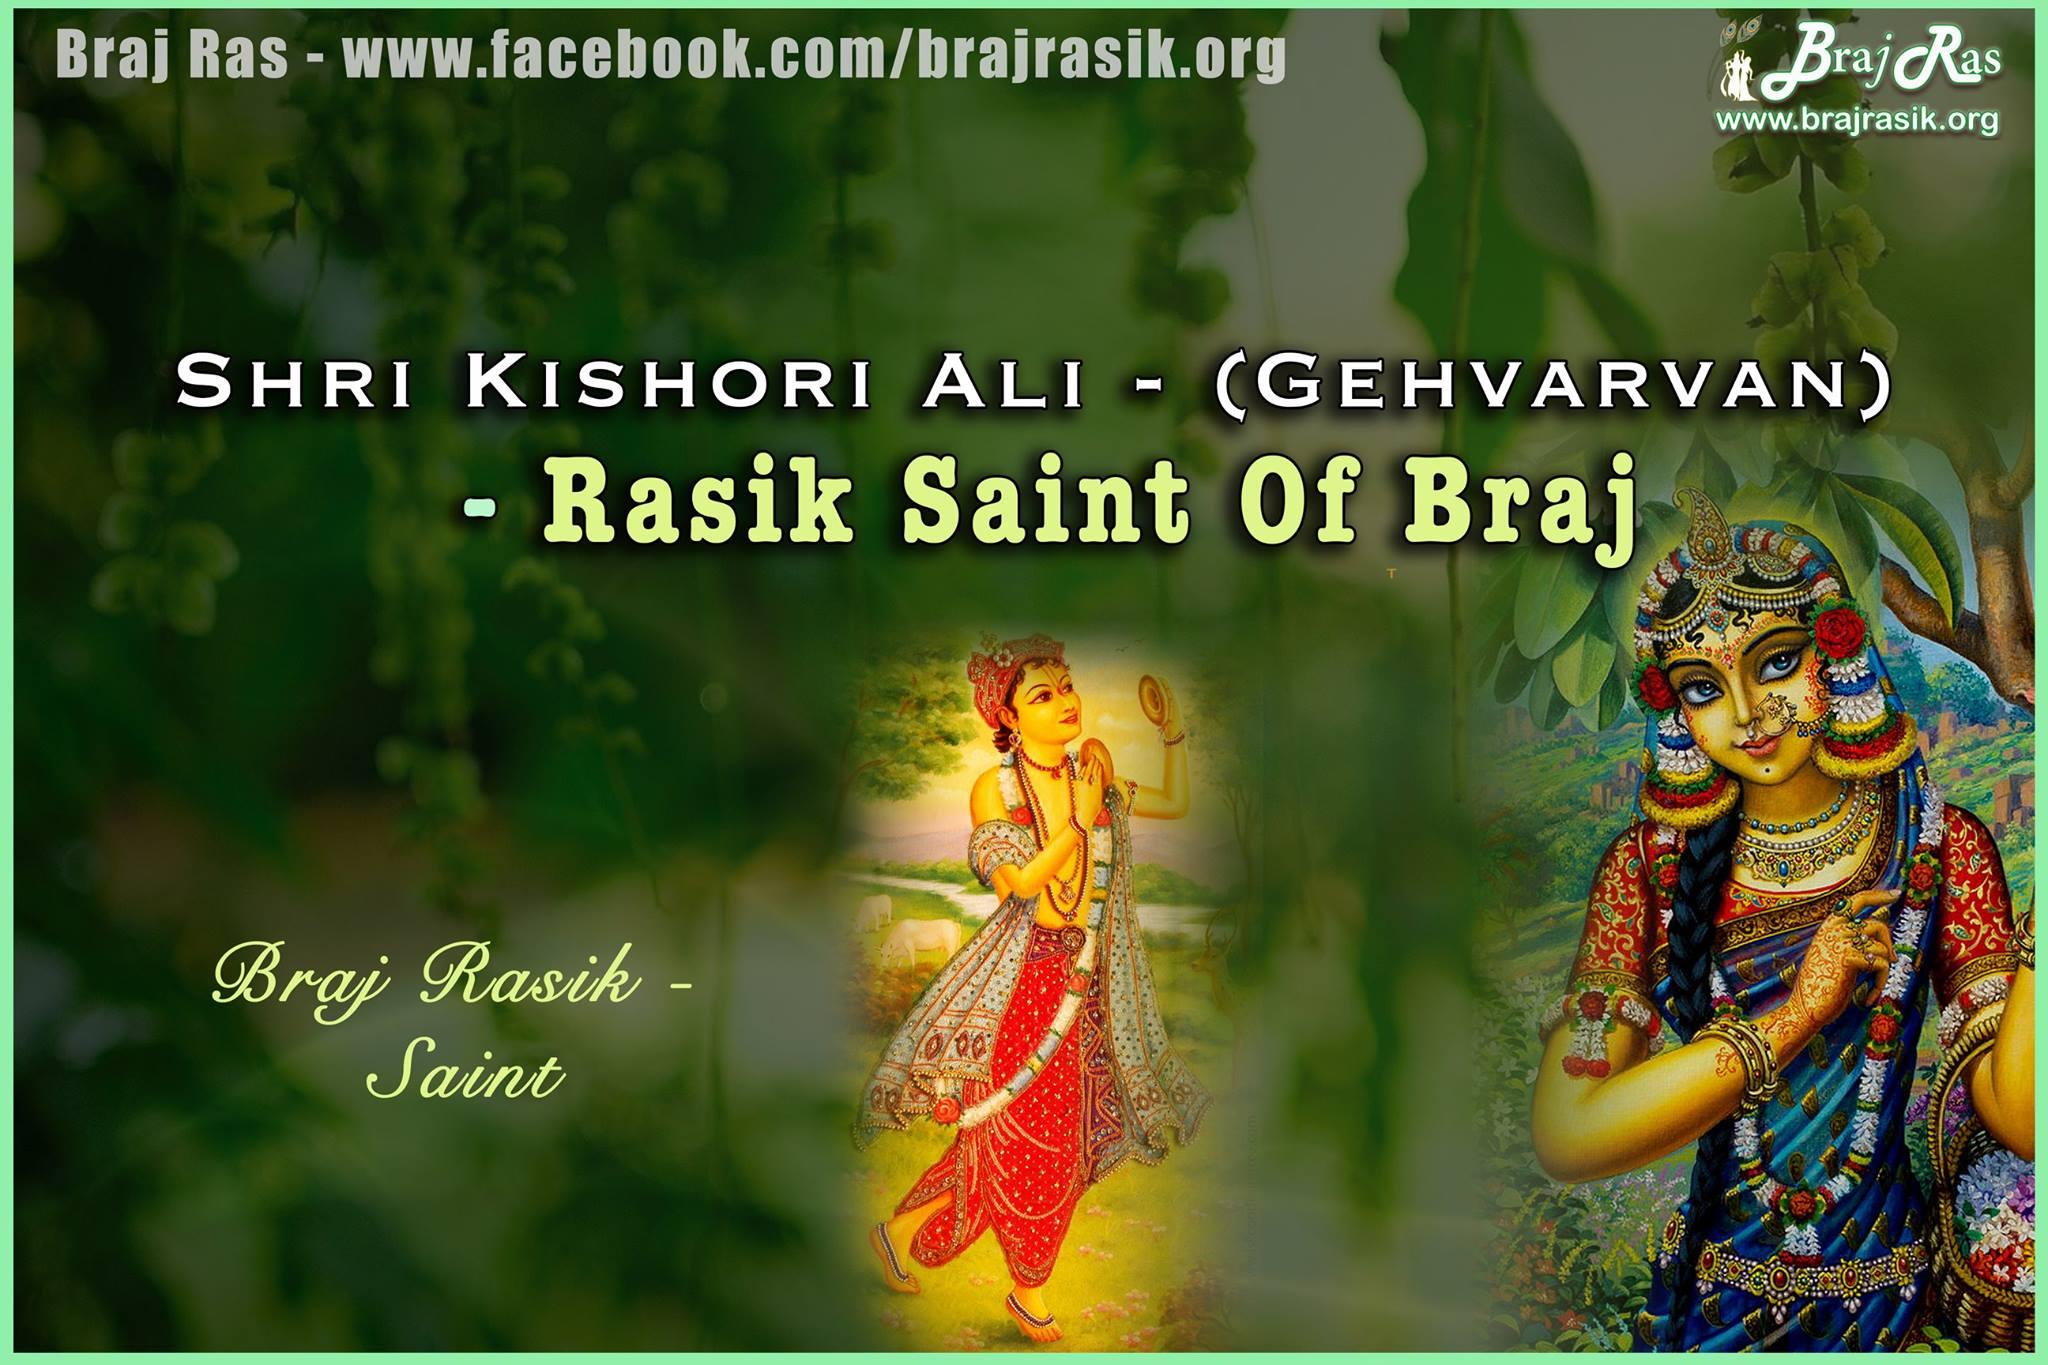 Shri Kishori Ali - Rasik Saint of Braj